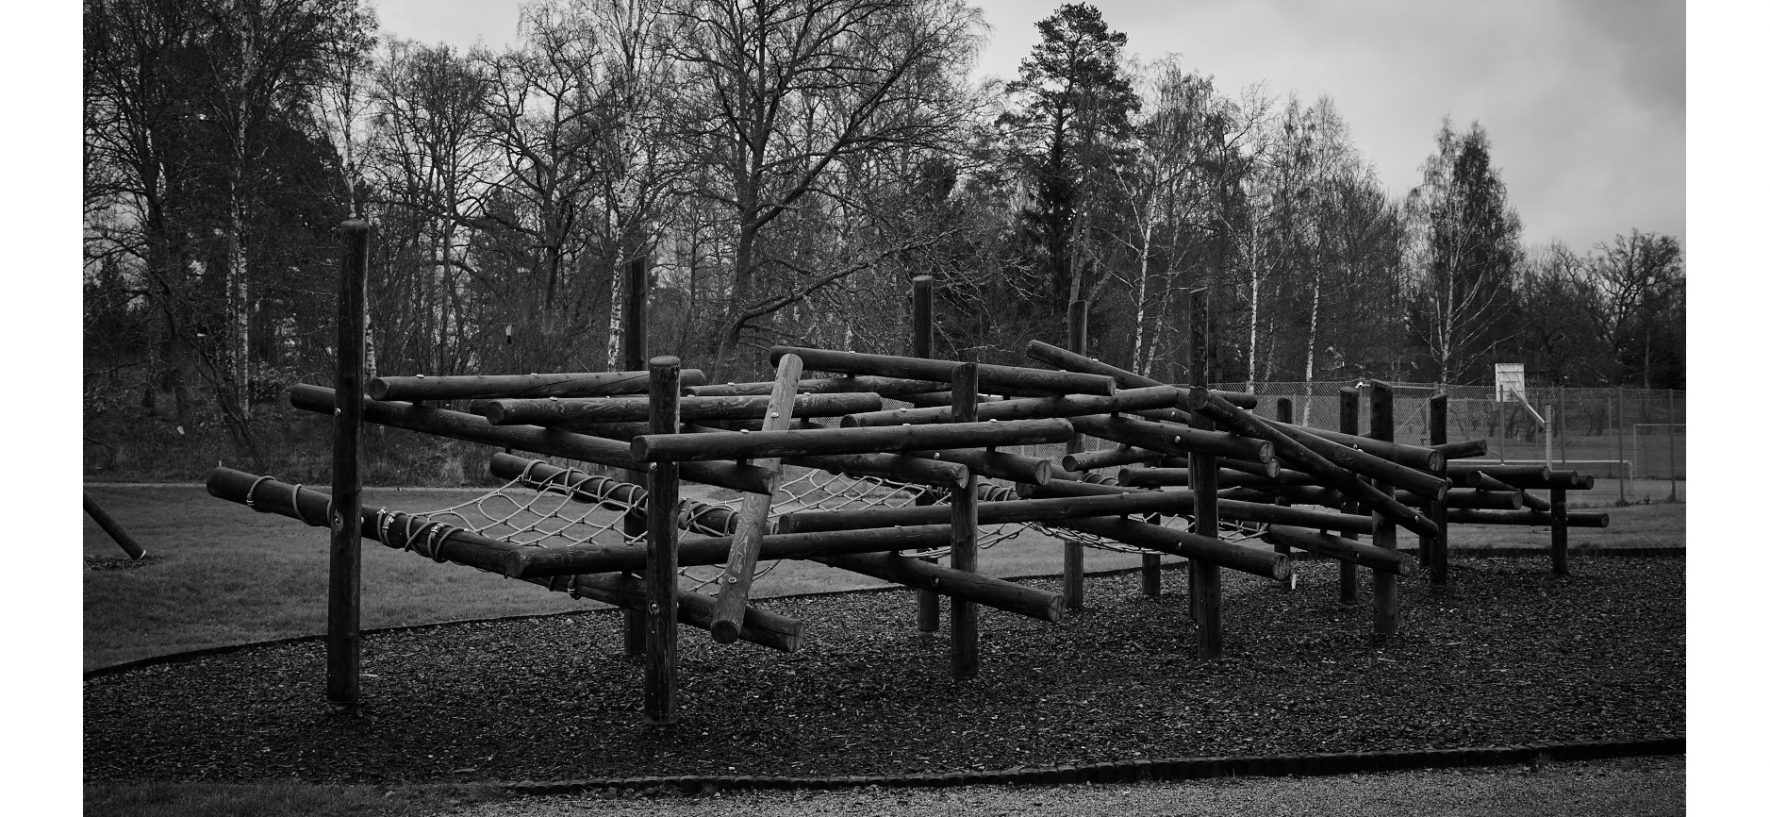 Marholmen, Norrtälje